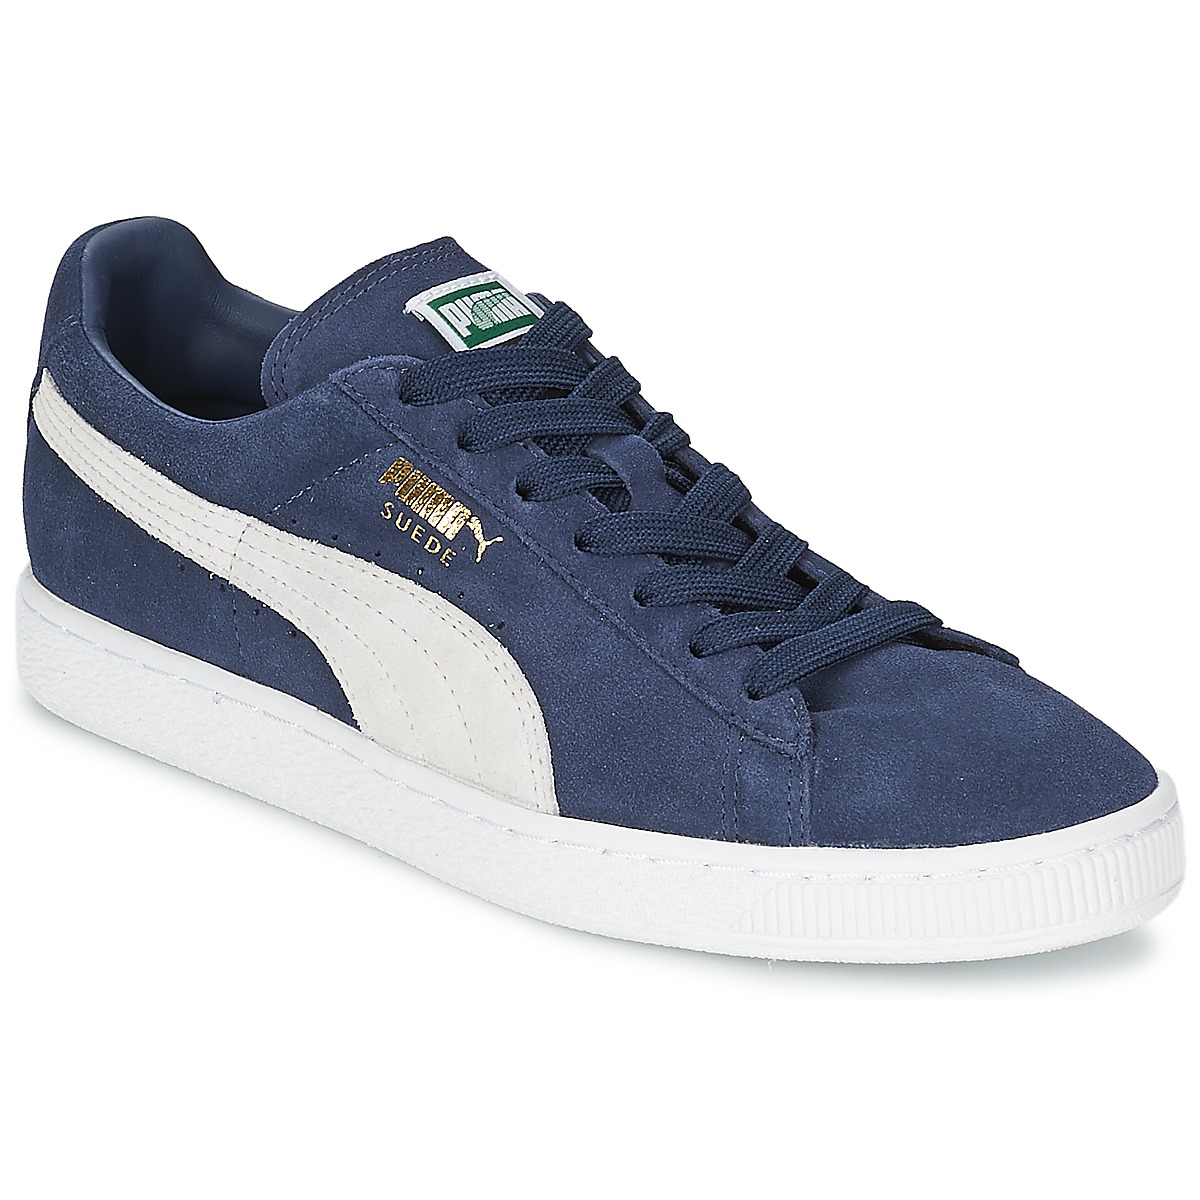 Puma SUEDE CLASSIC Blau / Weiss - Kostenloser Versand bei Spartoode ! - Schuhe Sneaker Low  67,99 €